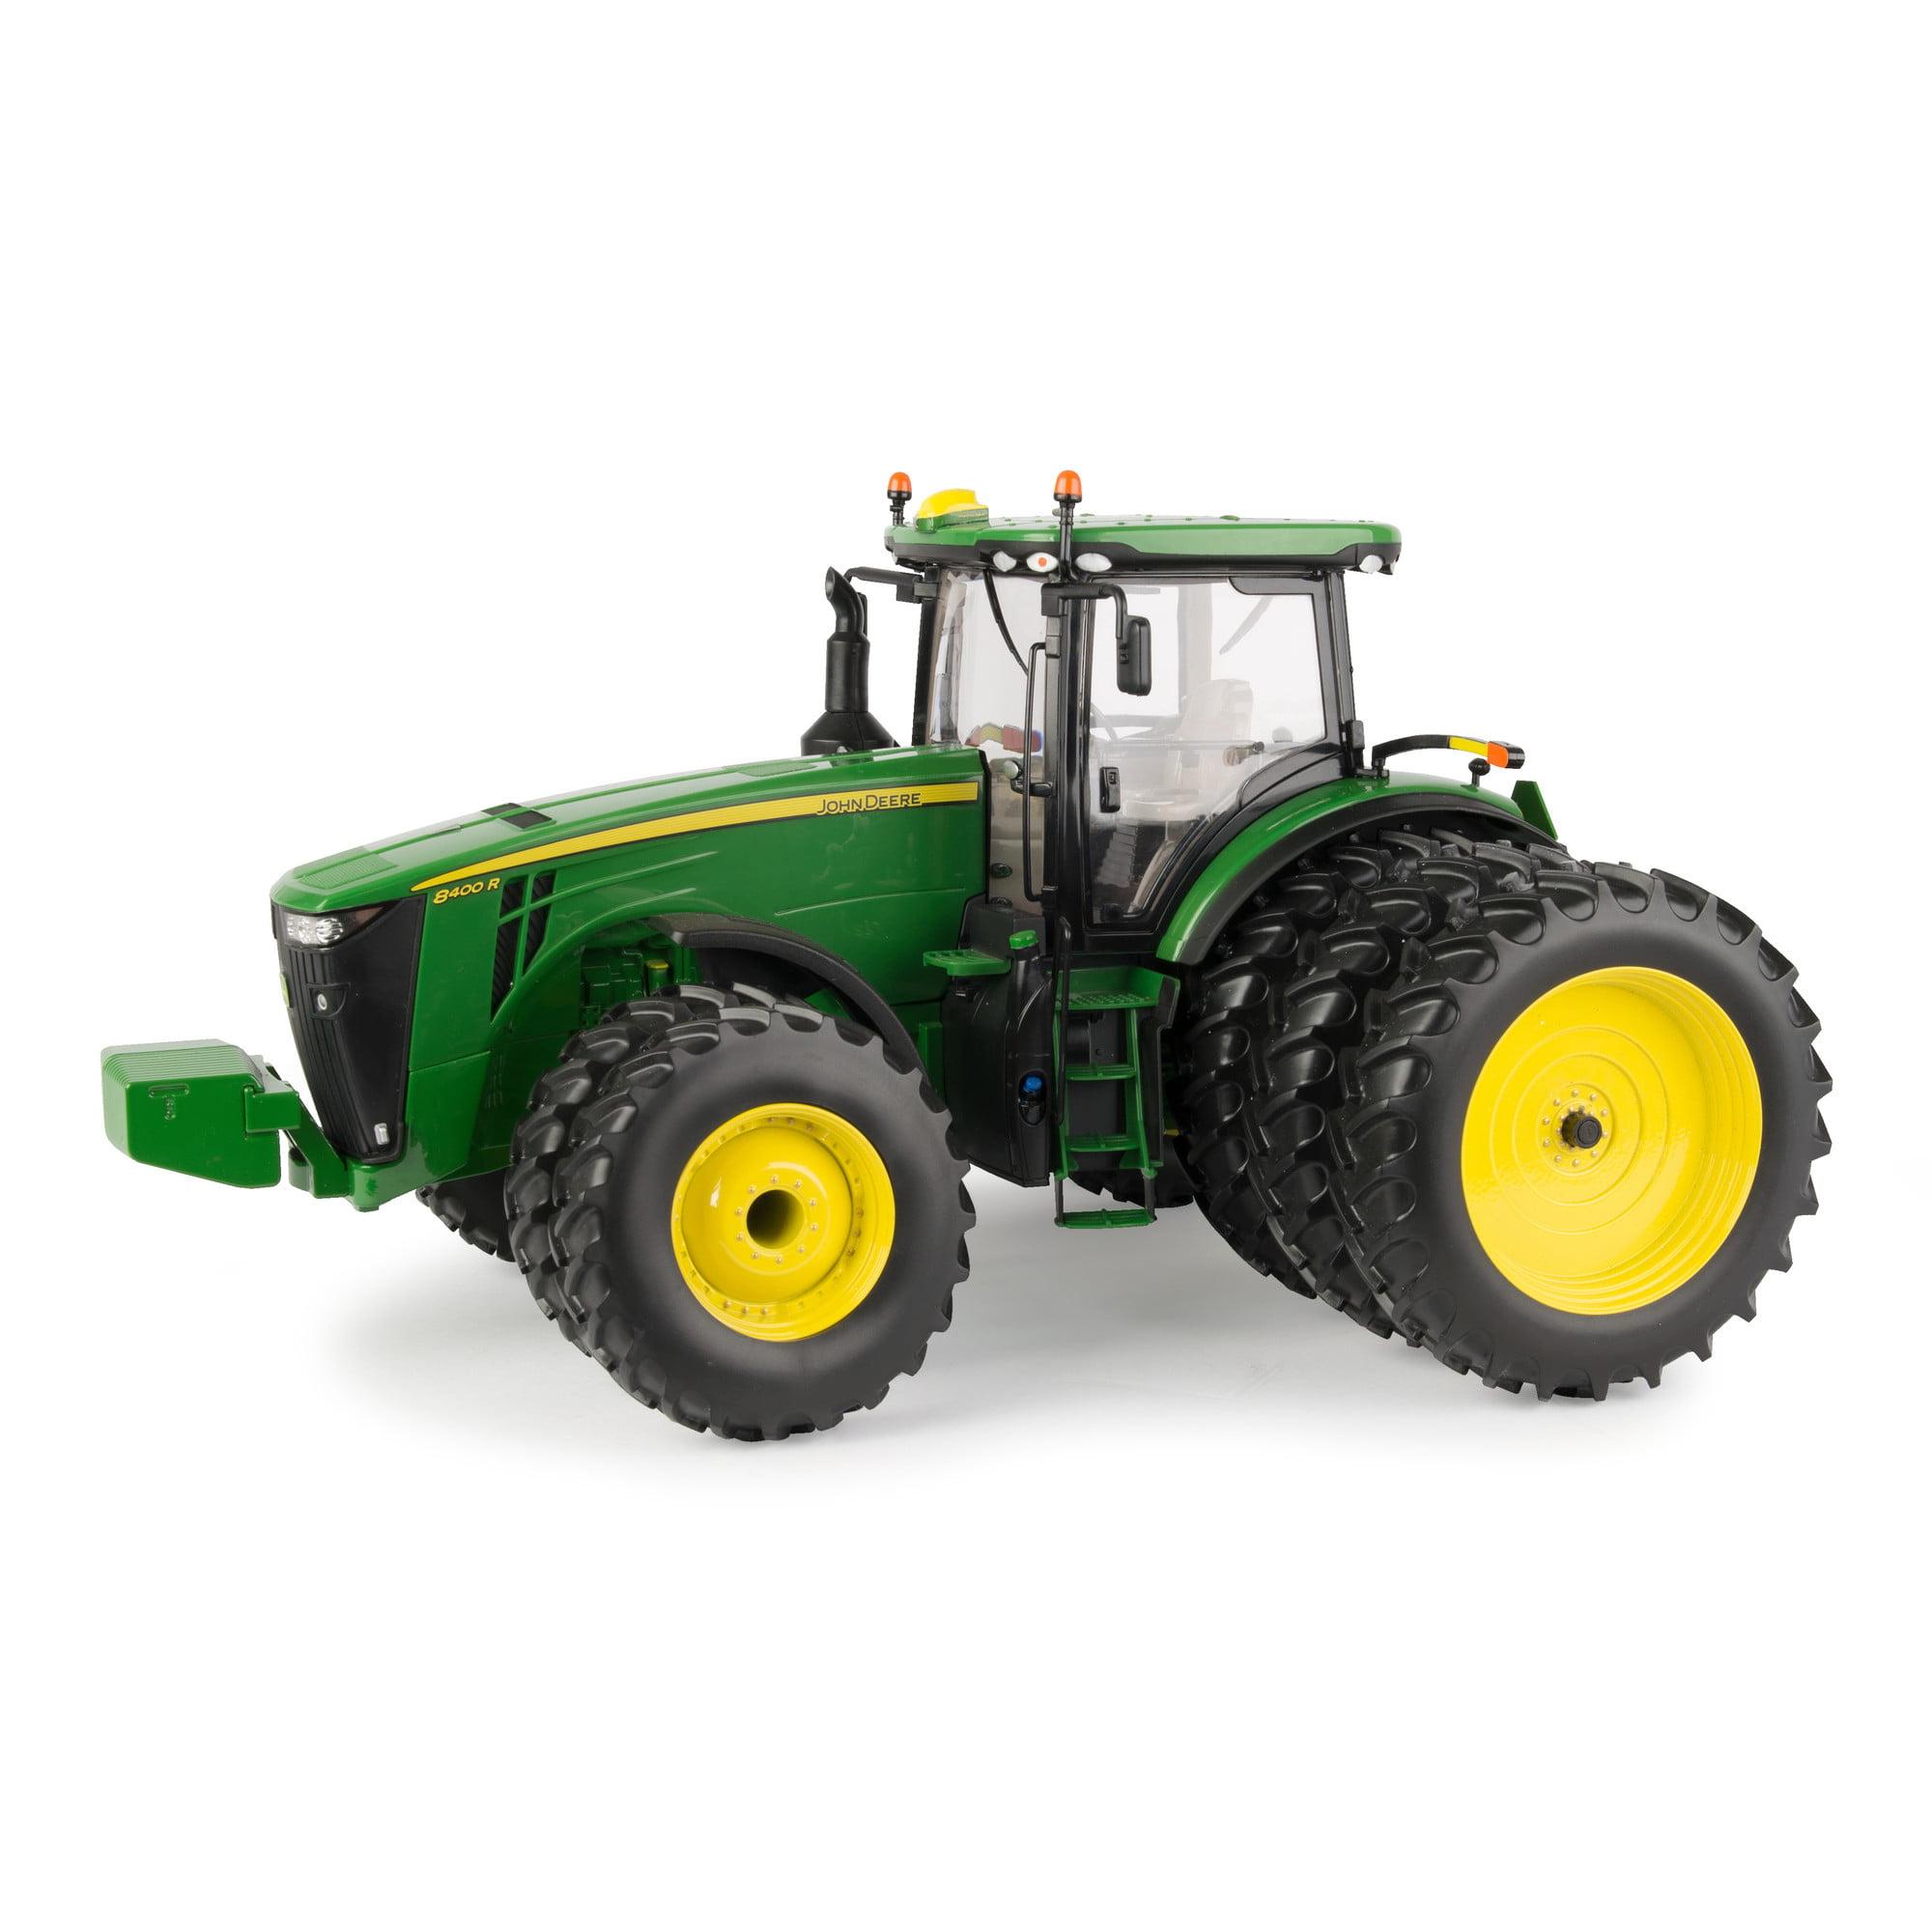 1:16 John Deere 8400R Prestige Tractor by Tomy Inc